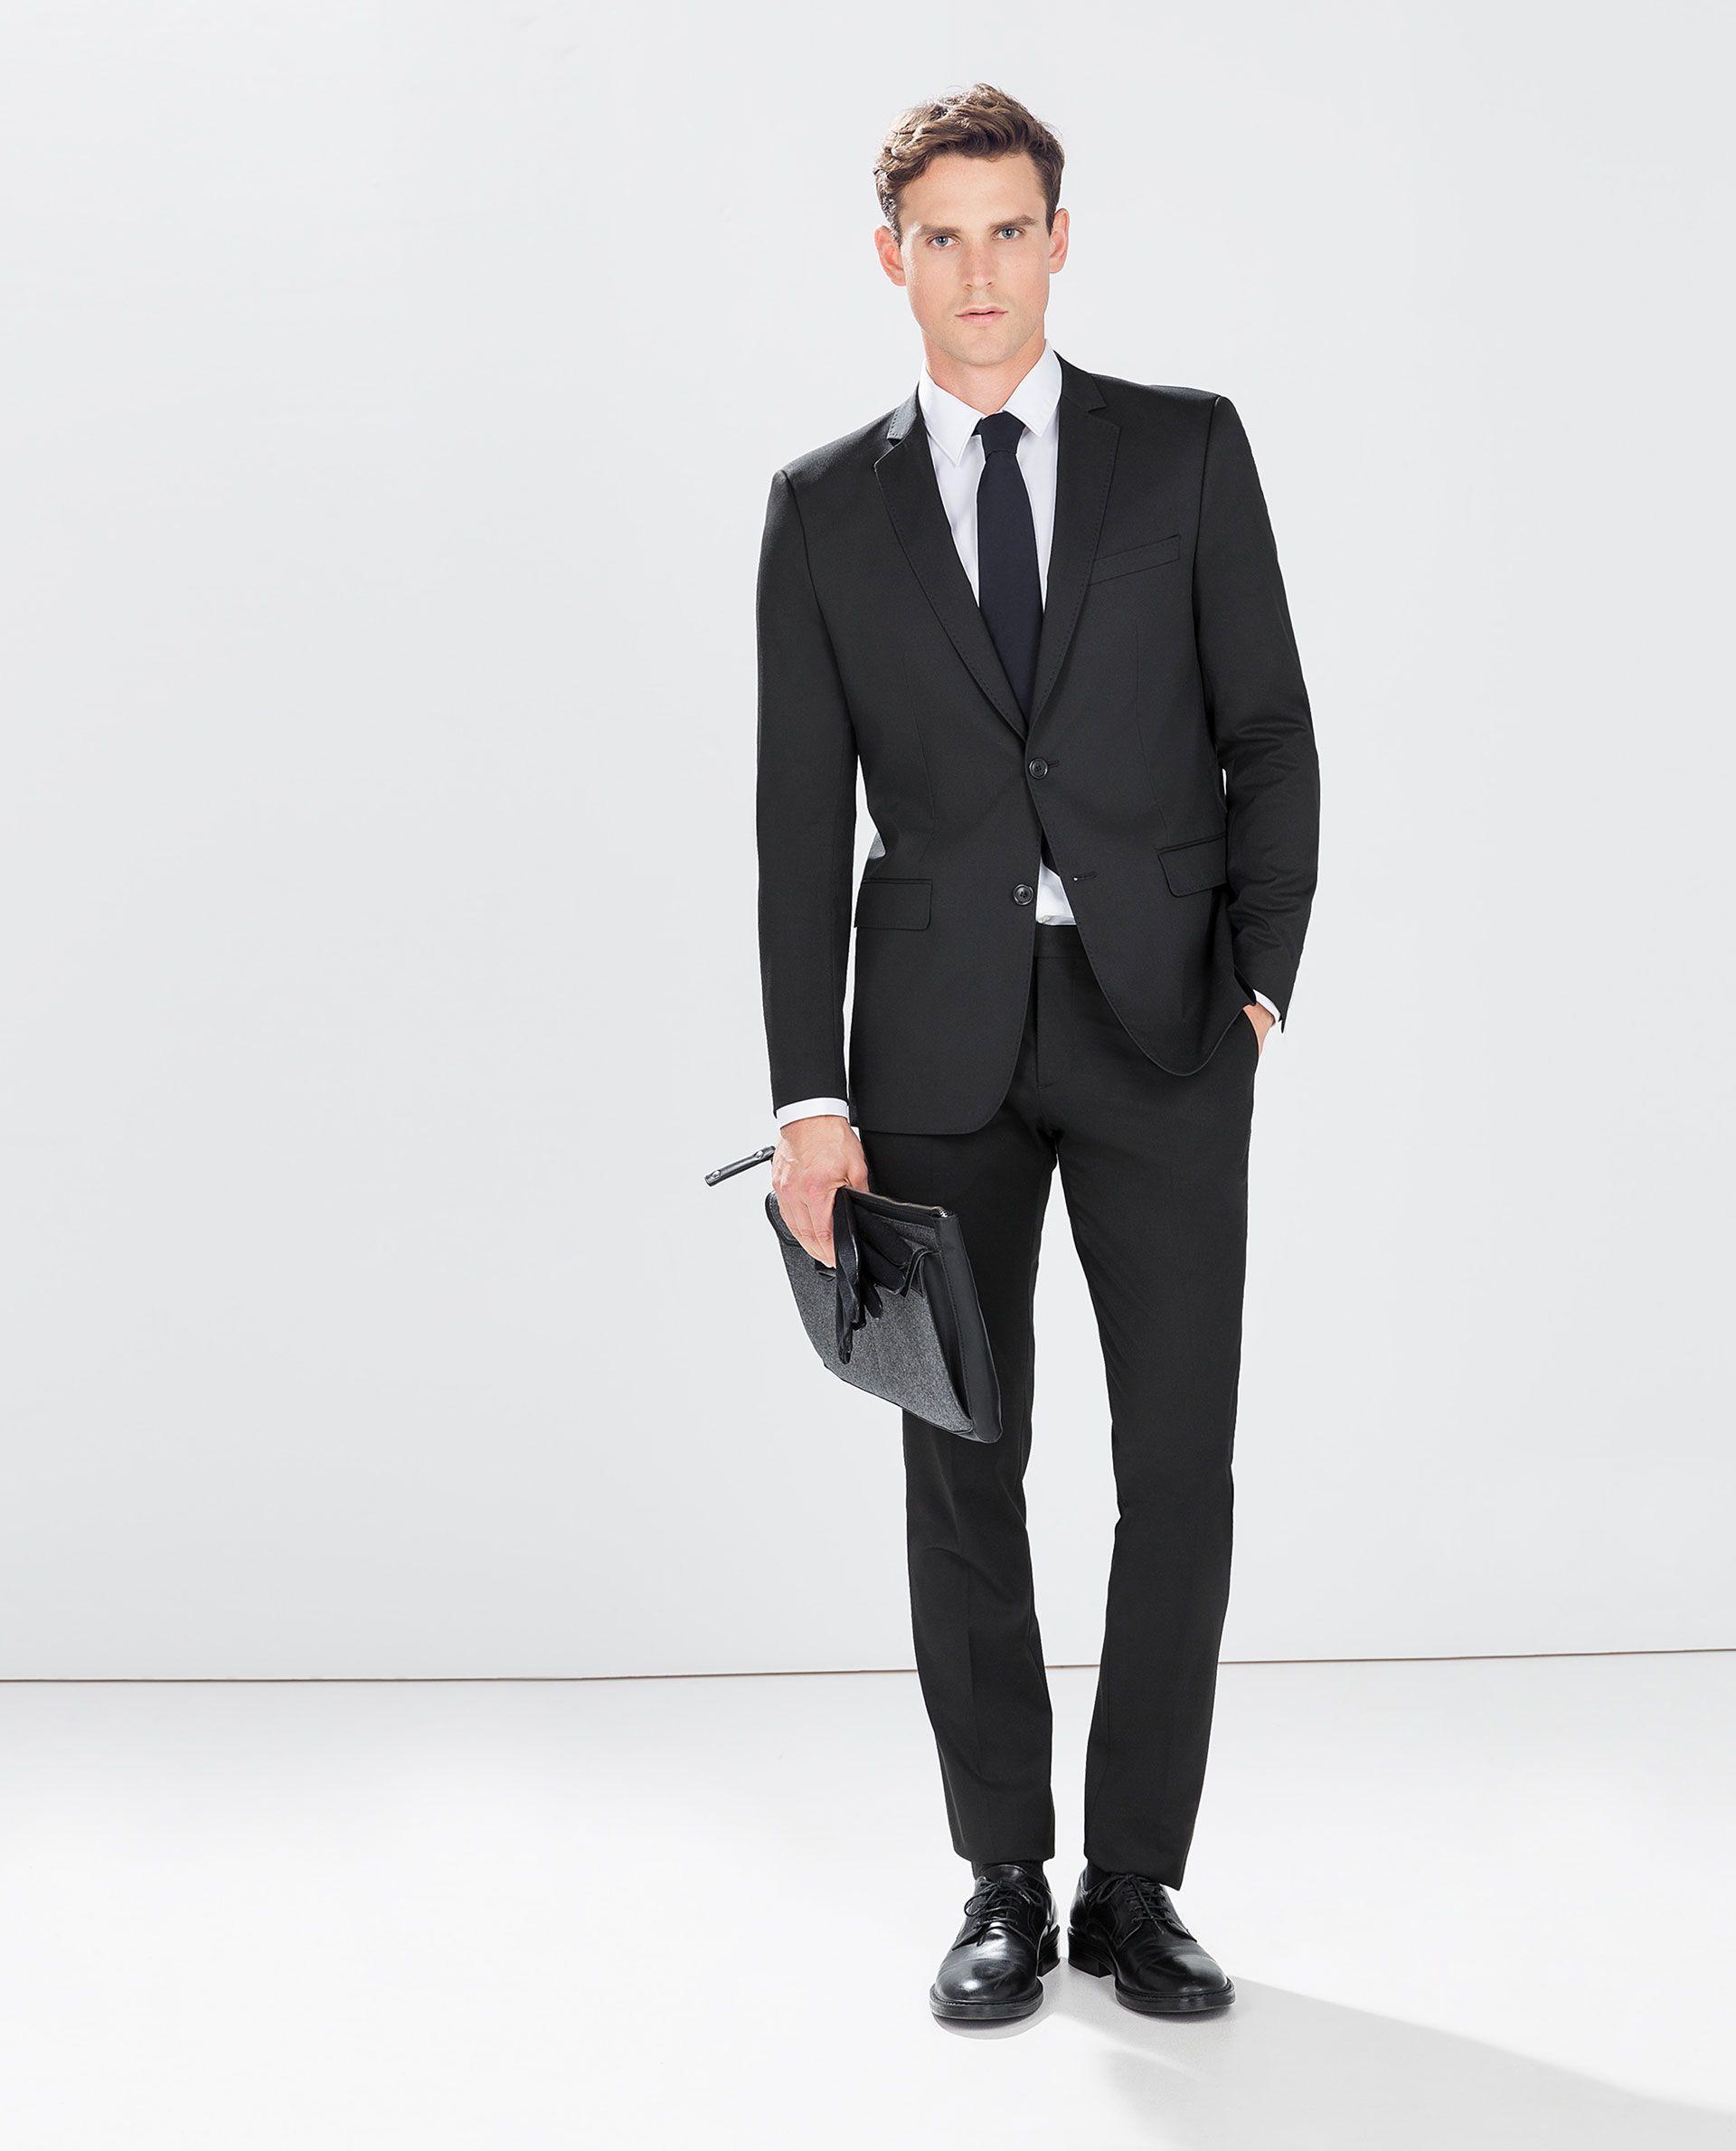 d2decdb405d7 ZARA - HOMBRE - TRAJE BASICO NEGRO | Moda | Zara hombre traje ...